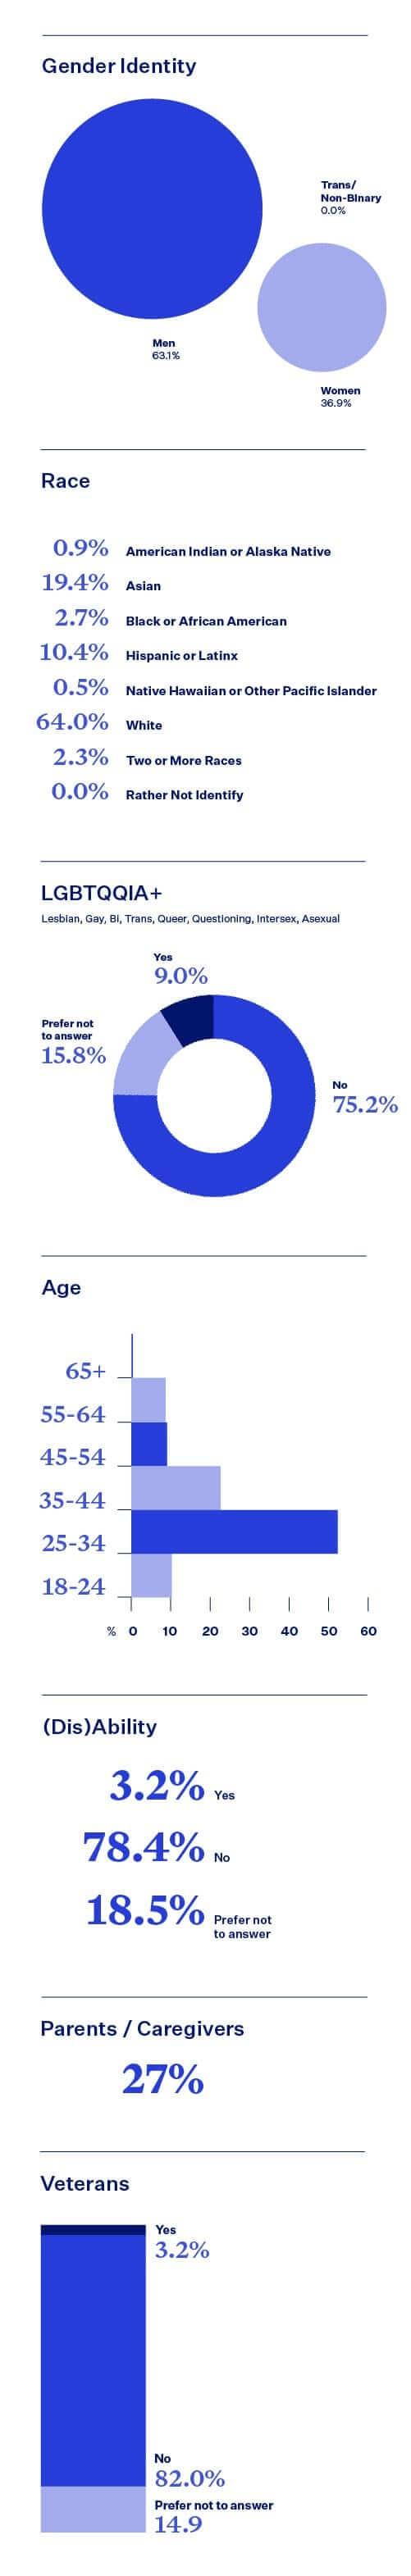 Blend DIB statistics, non-tech